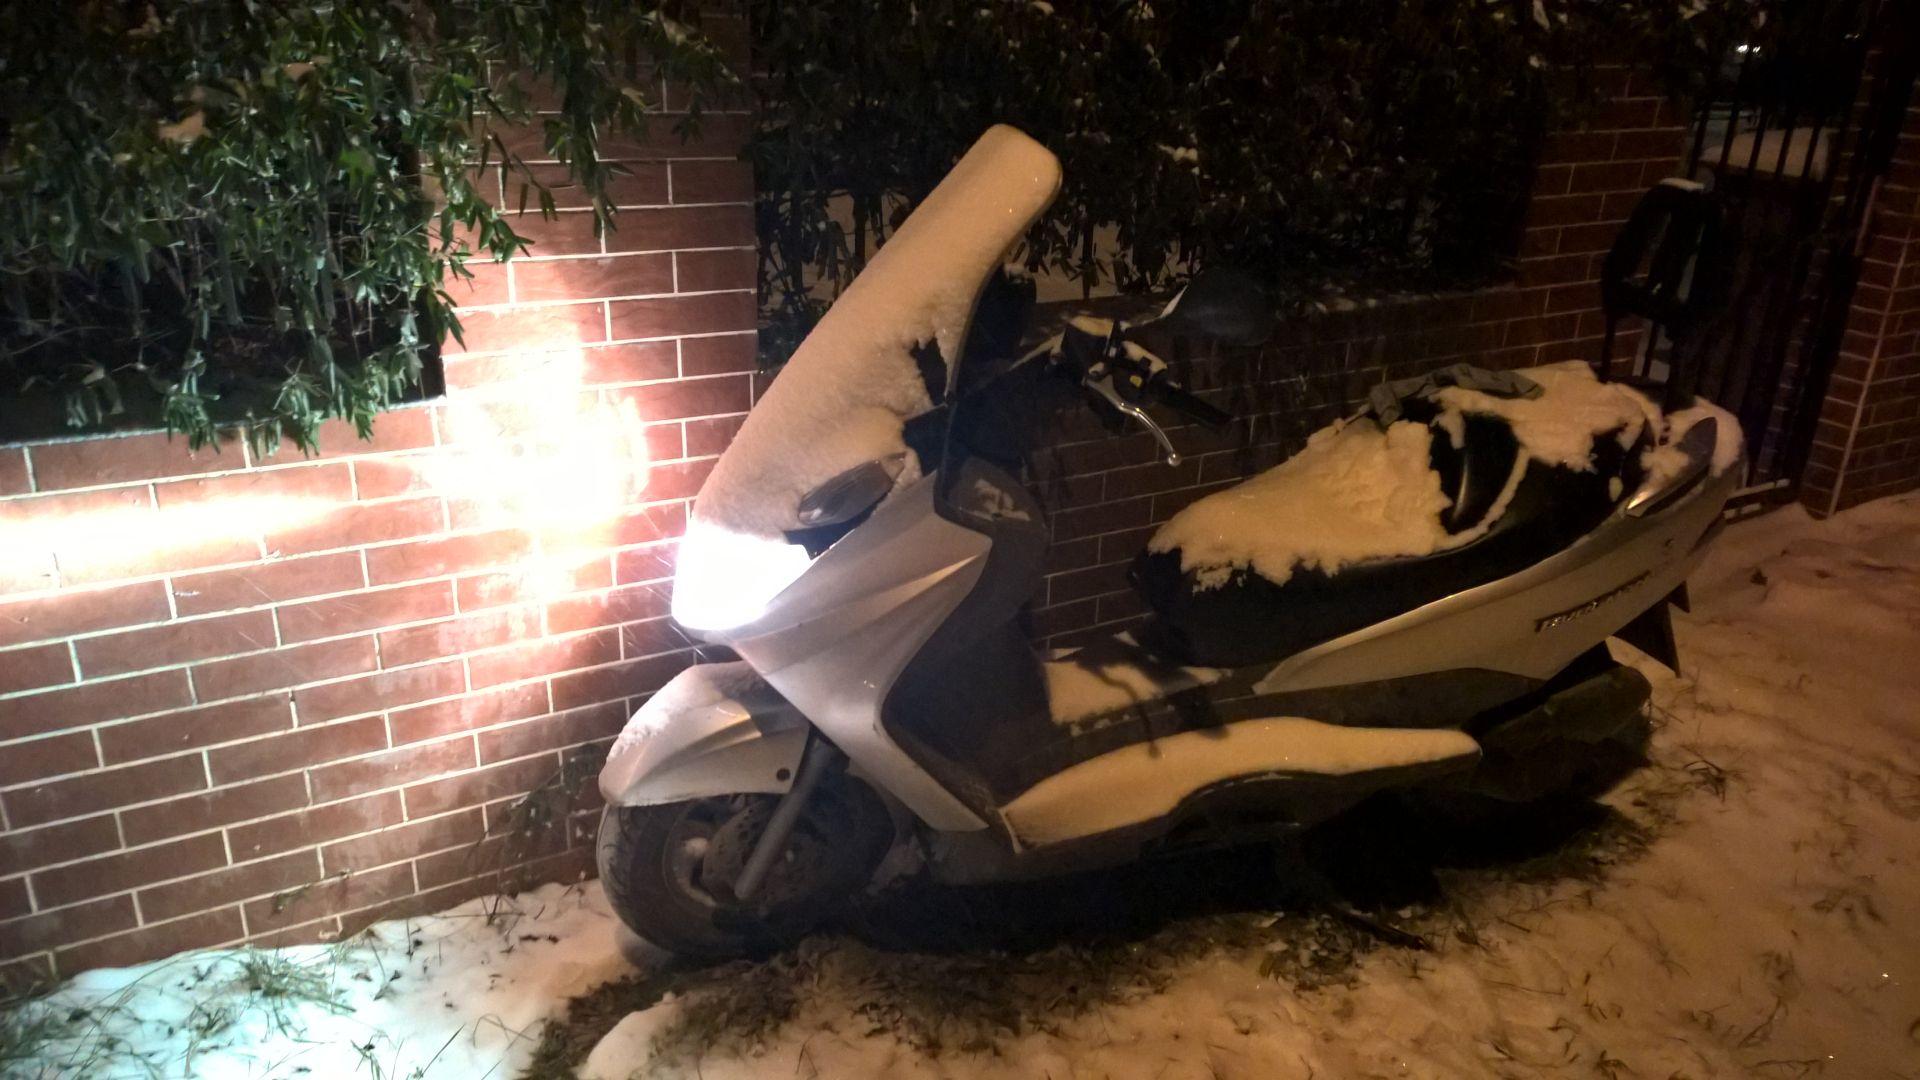 Riding Burgman in the snow